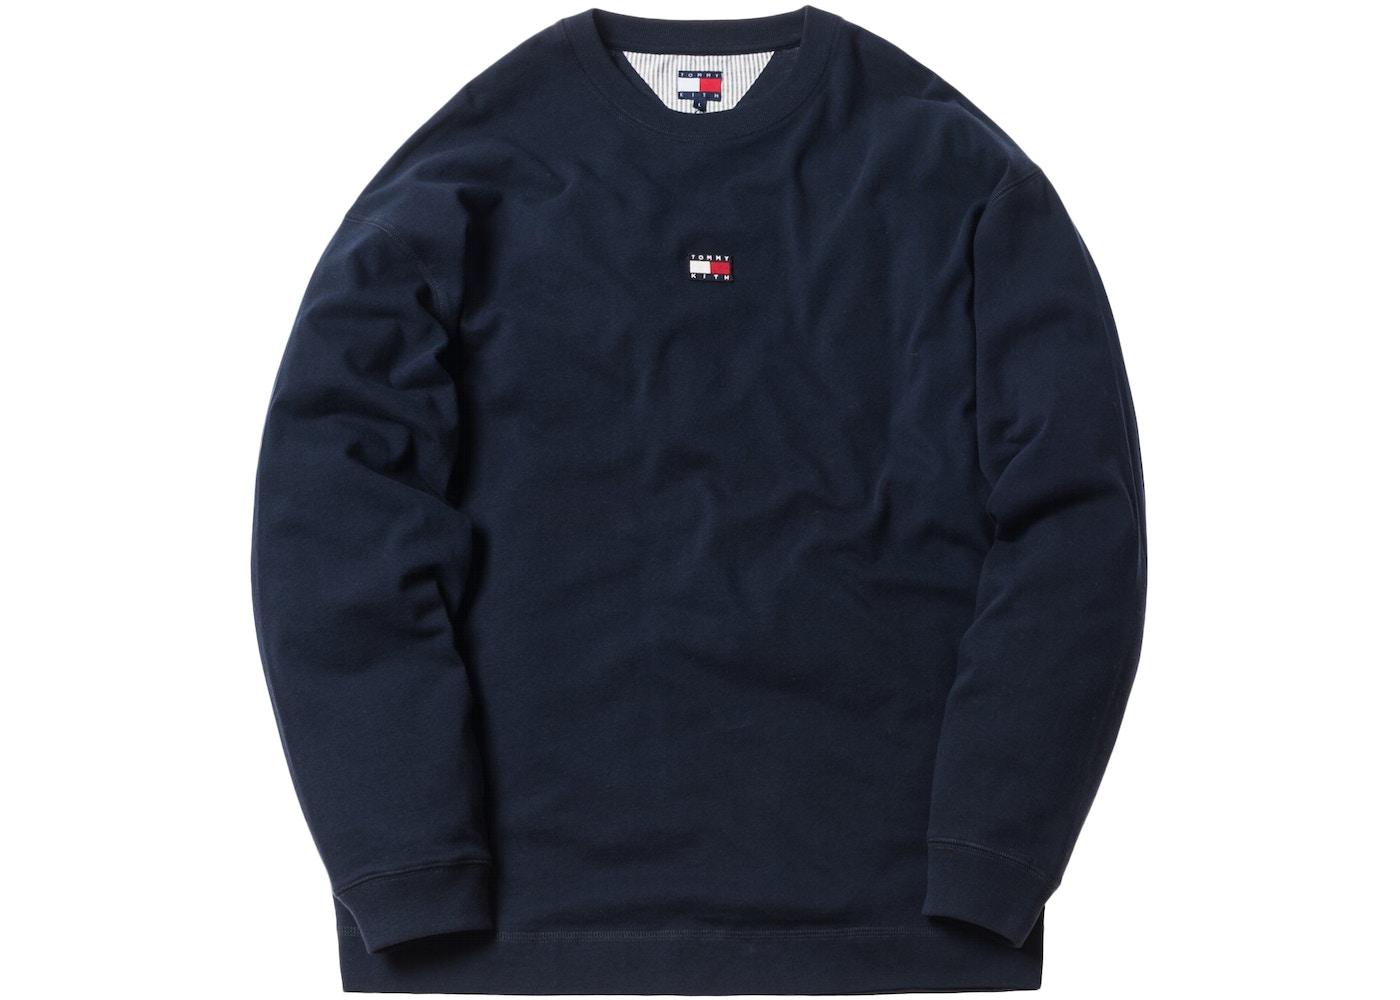 b3cdc0d9 Kith T-Shirts - Buy & Sell Streetwear